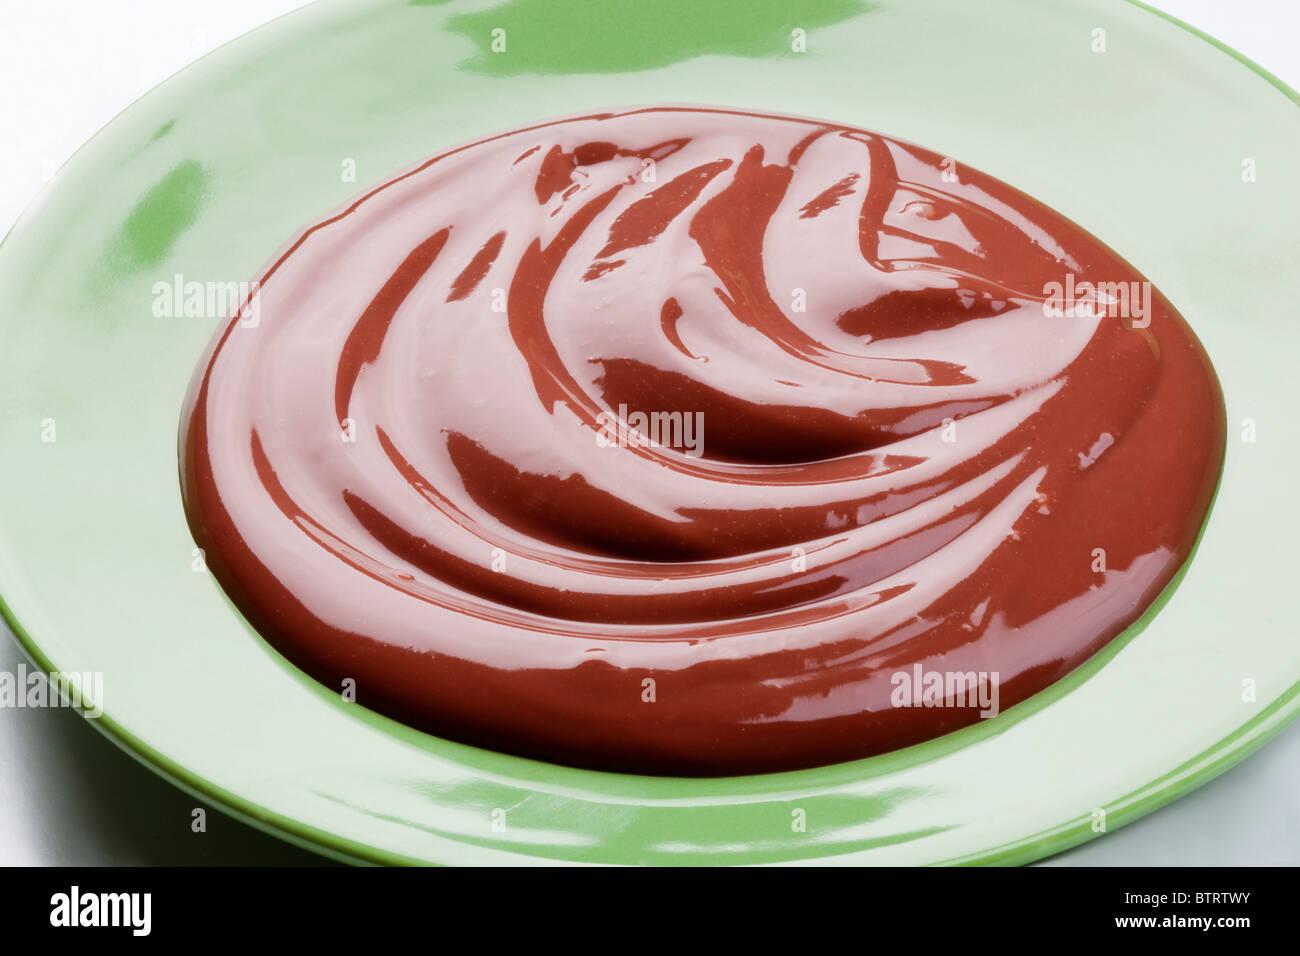 Swirl of chocolate cream on a plate - Stock Image